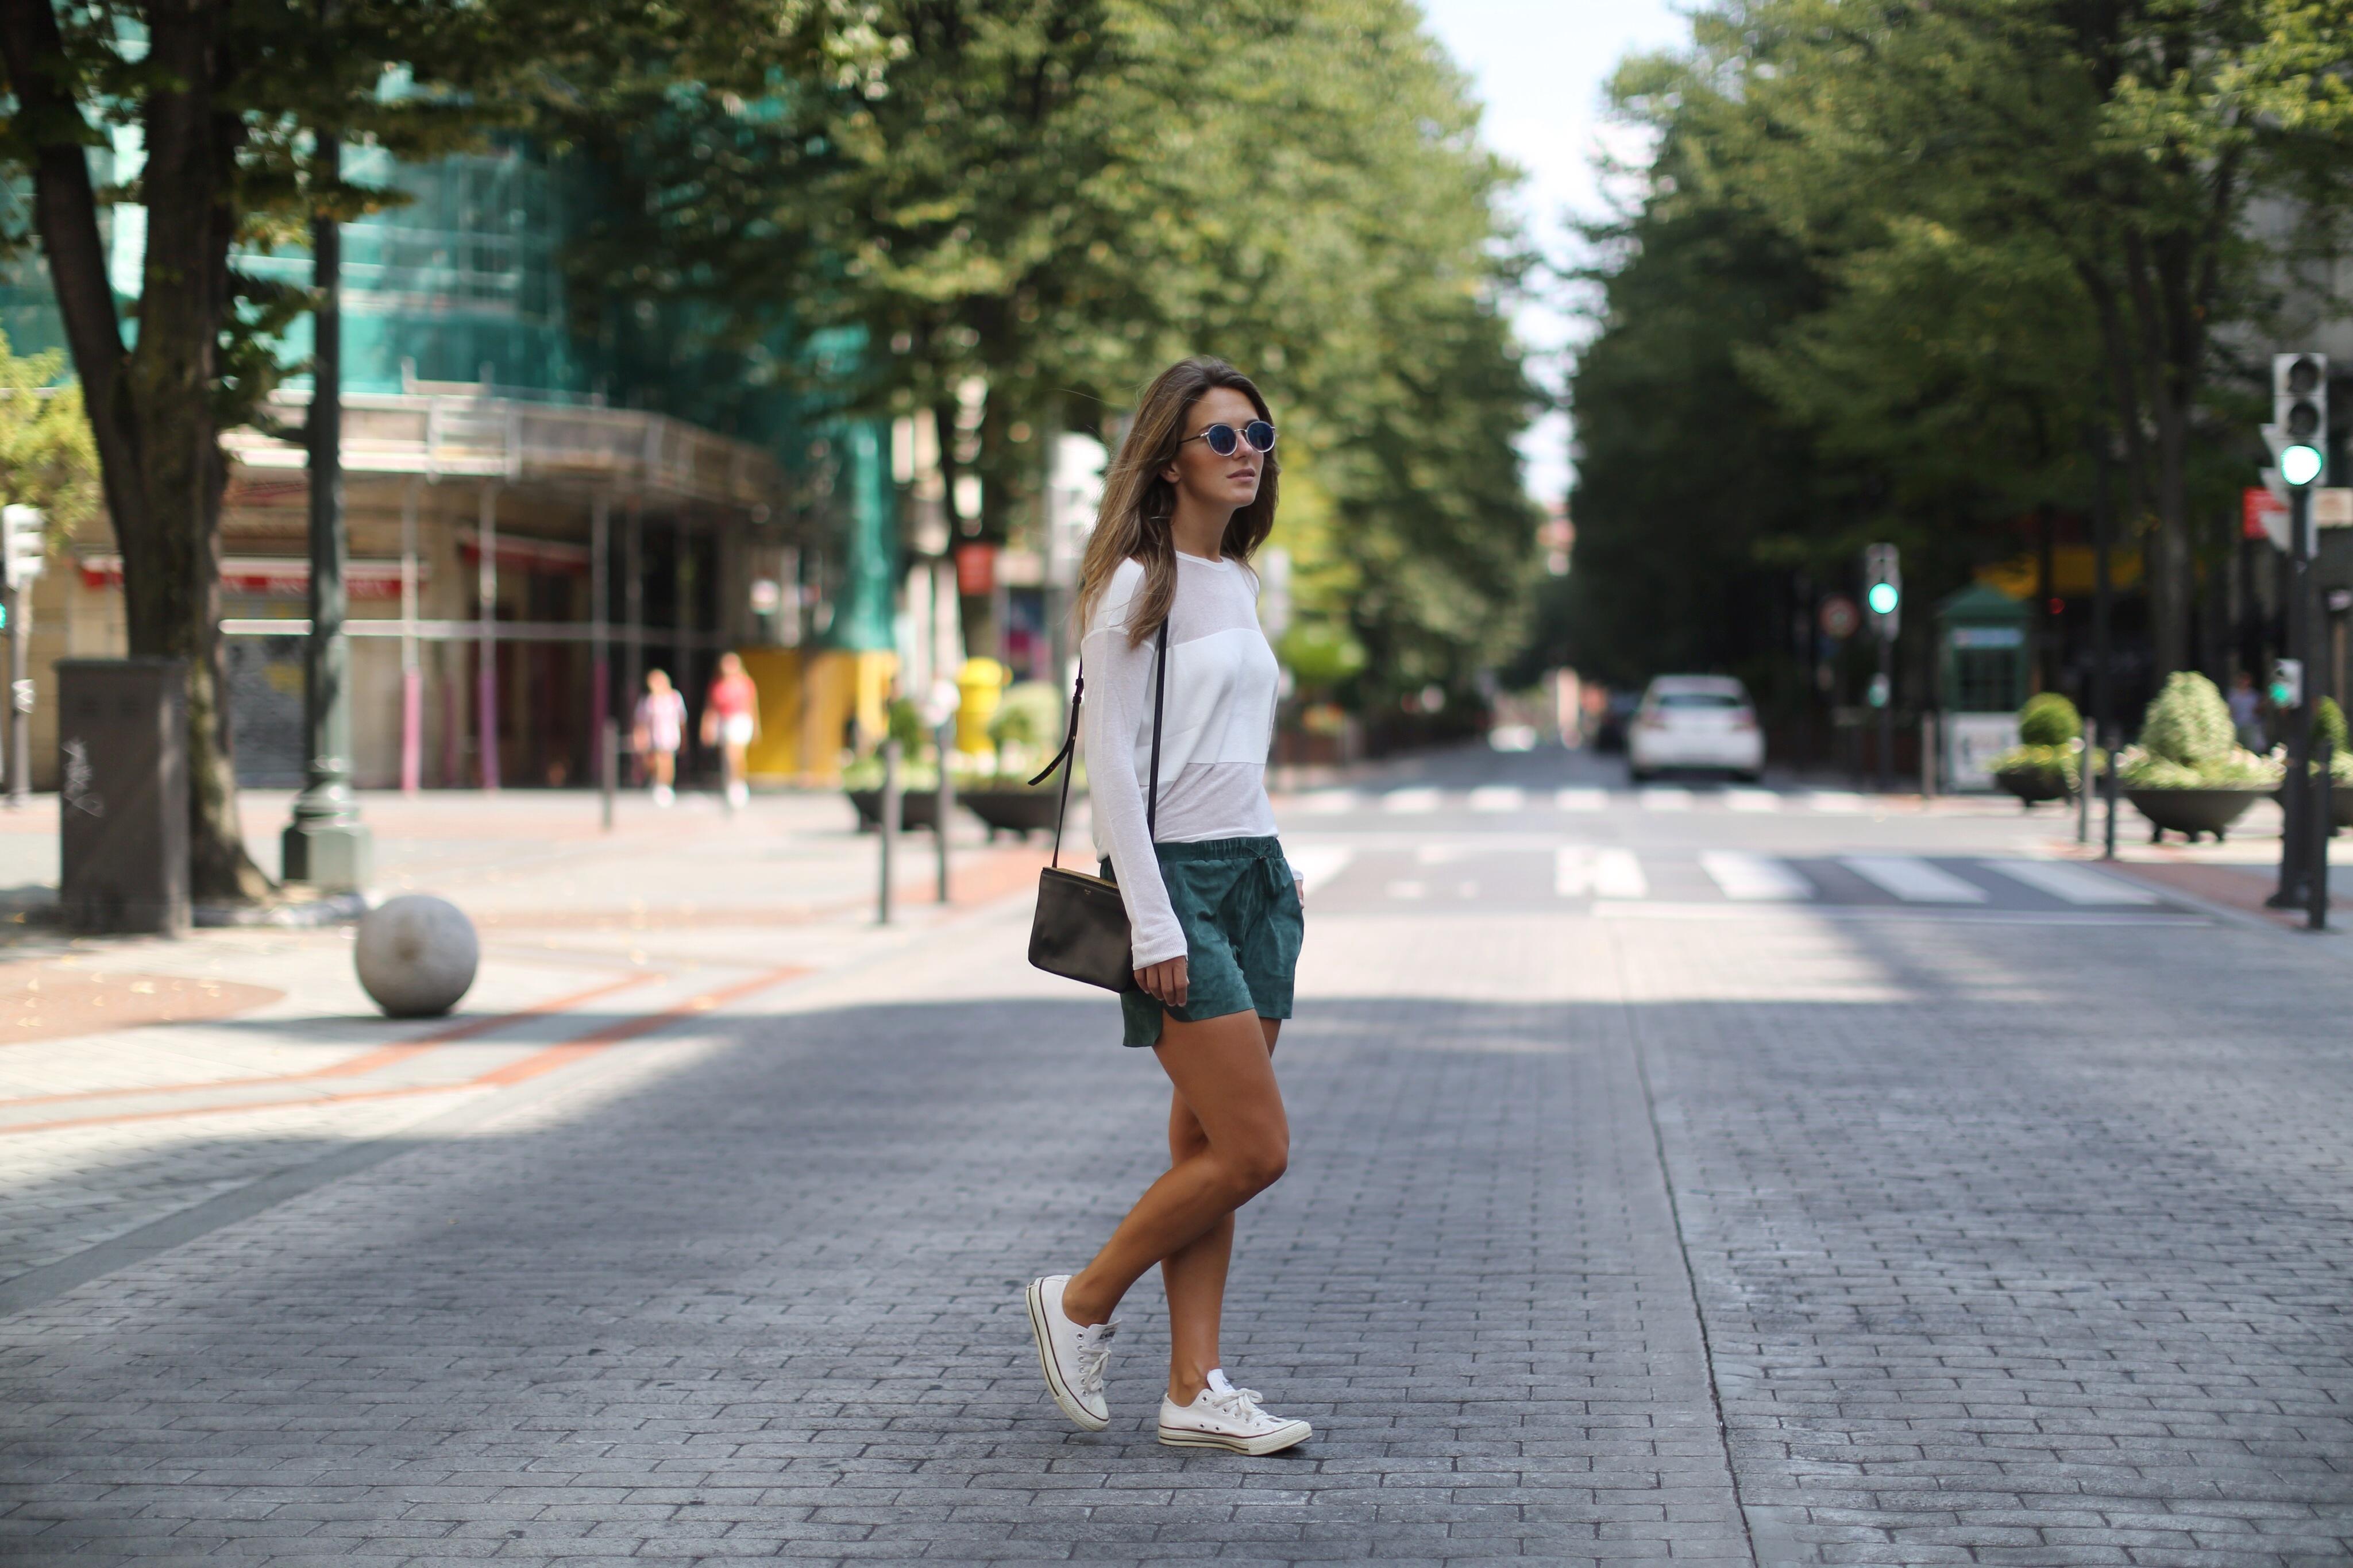 Clochet_h&m_trend_suede_shorts_converse_celine_trio_bag_01